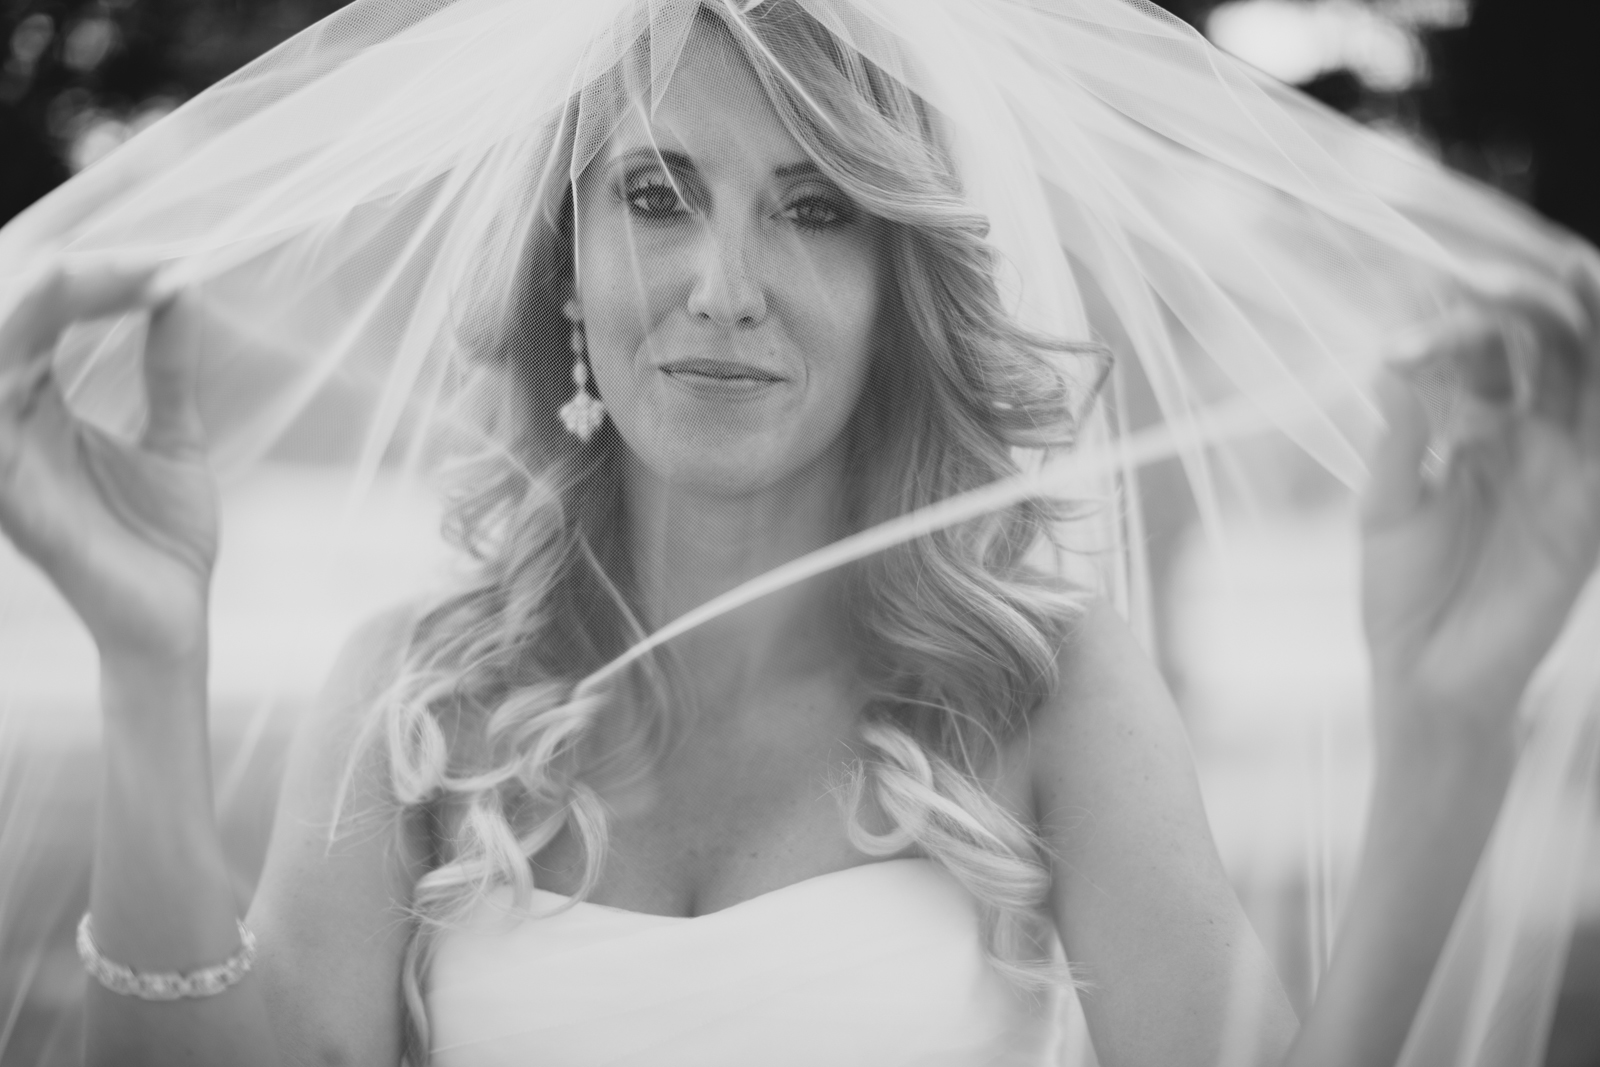 Northern Michigan Grand Traverse Resort Black Tie Wedding Photographer - Codee and Aaron-011.jpg